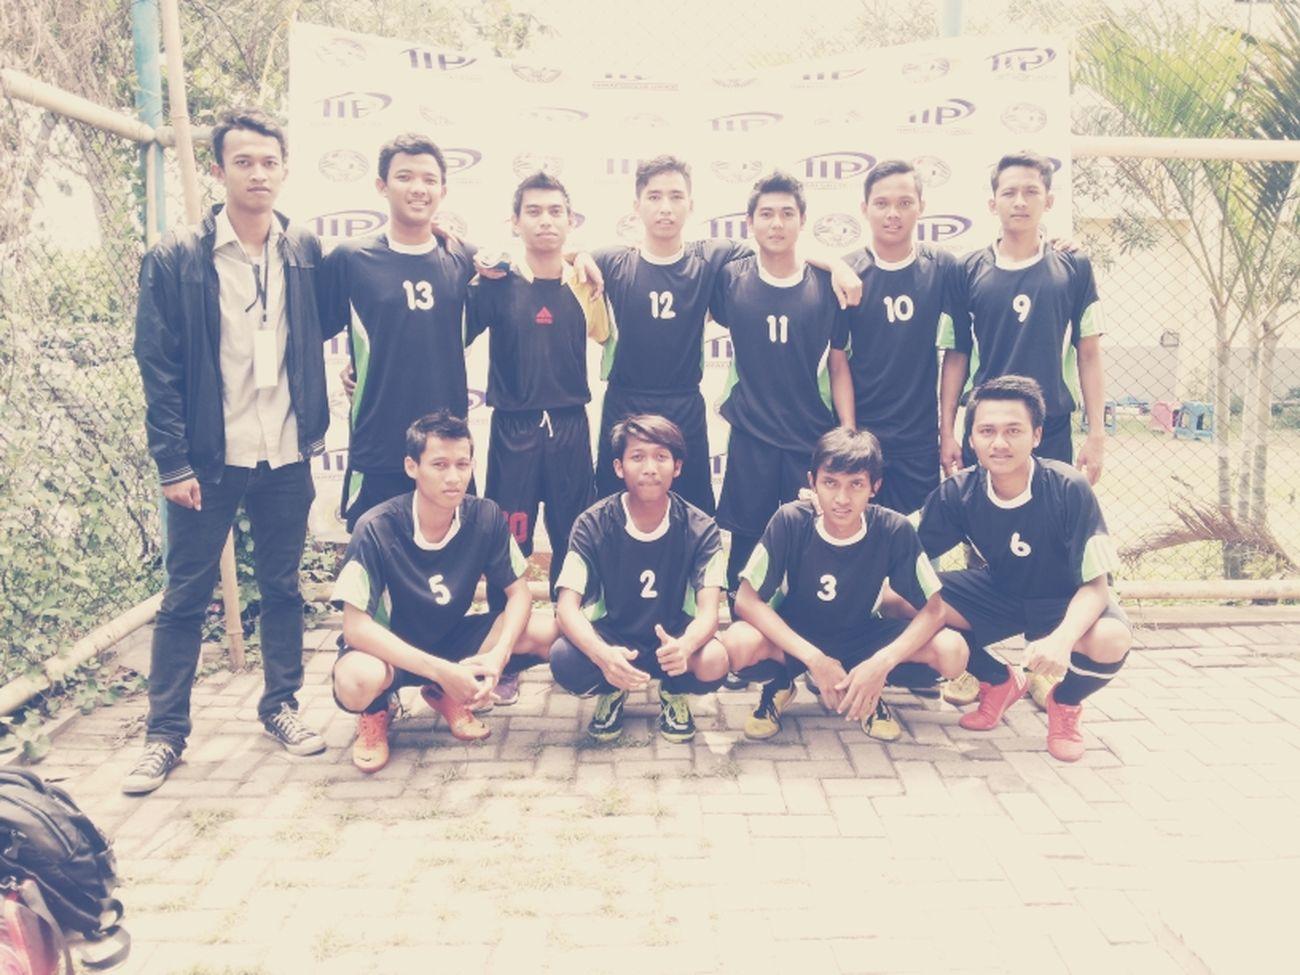 LembuSurofc Sports Campus Futsal Team